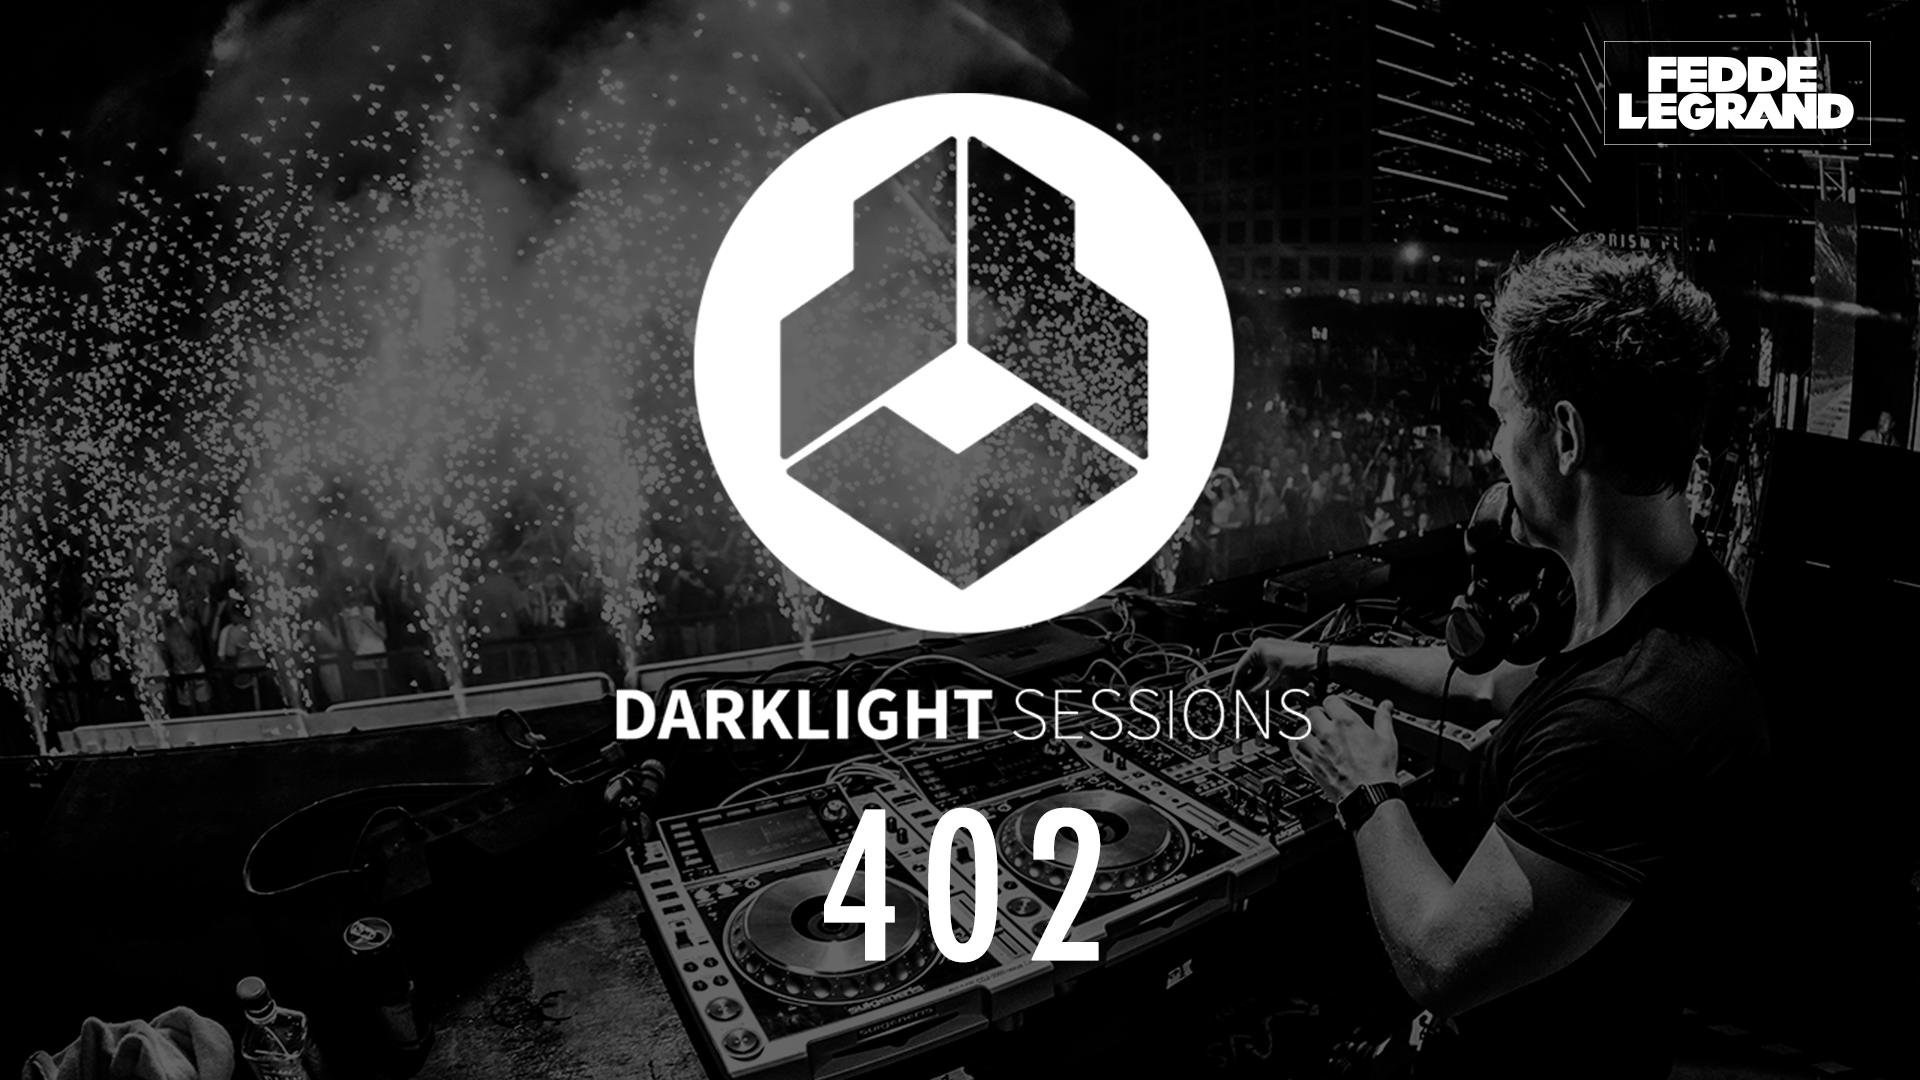 Darklight Sessions 402